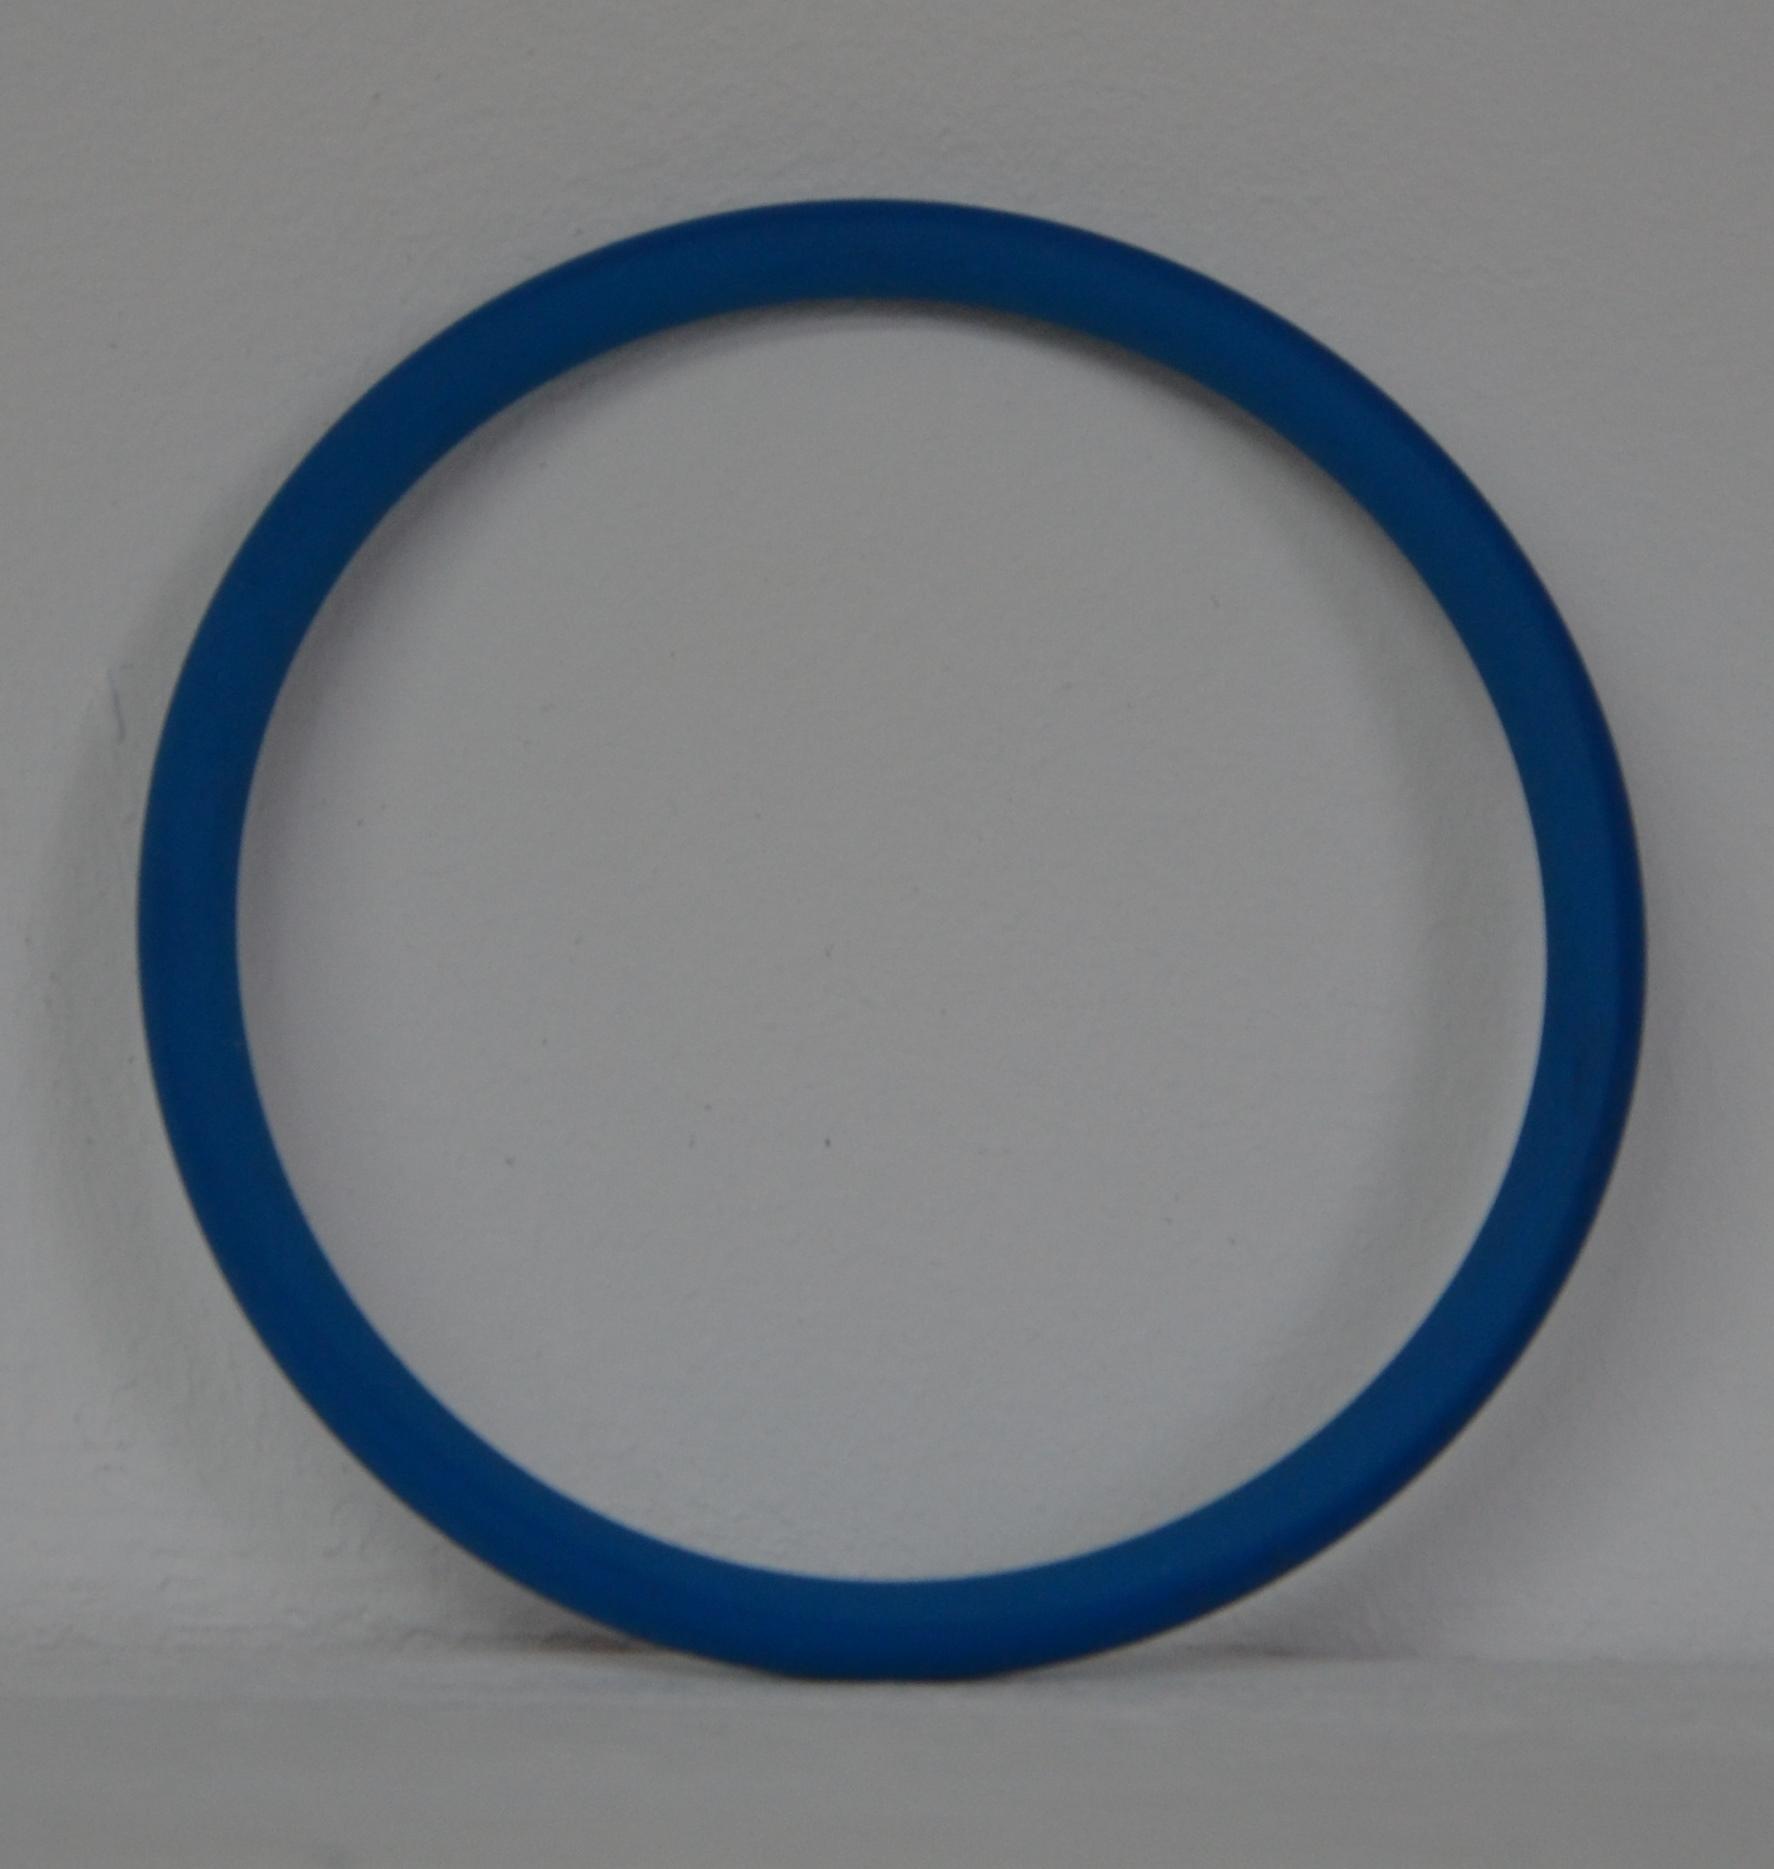 O-ring deksel uit diverse materialen Image